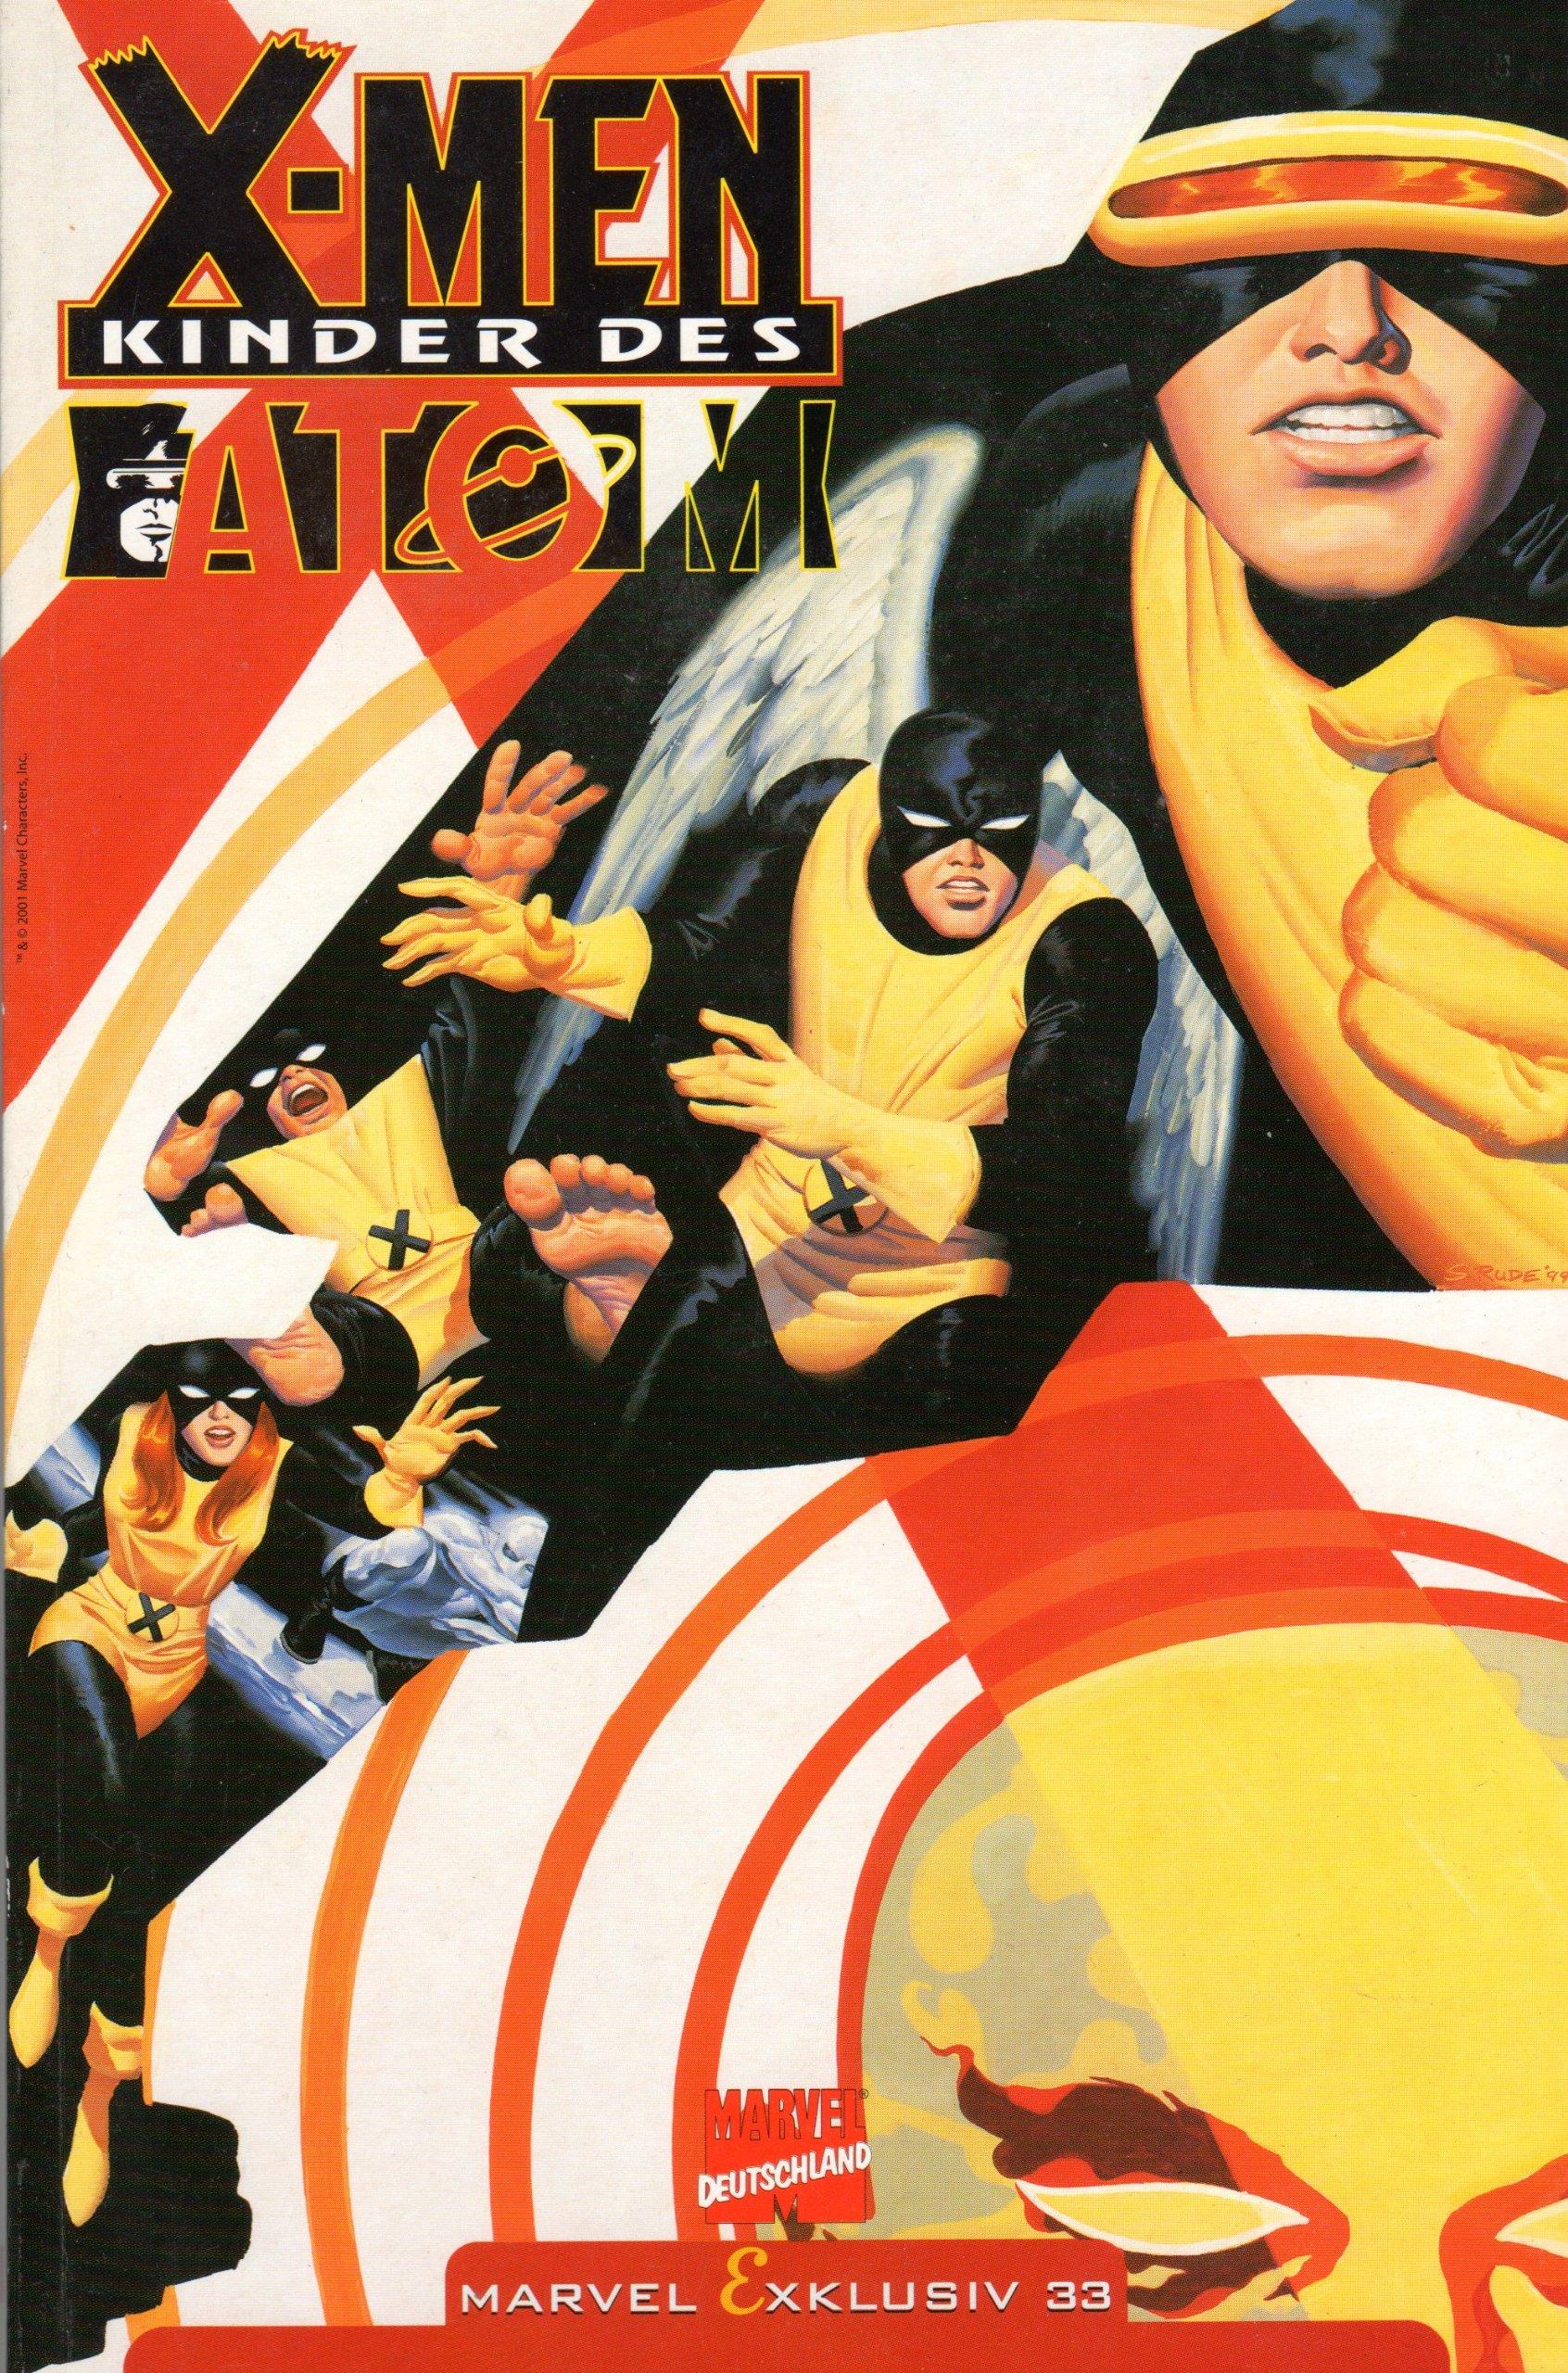 Marvel Exklusiv # 33 - X-Men Kinder des Atoms - Panini (X-Men) Comic – 2001 B004ZPULG4 Belletristik - Comic Cartoon